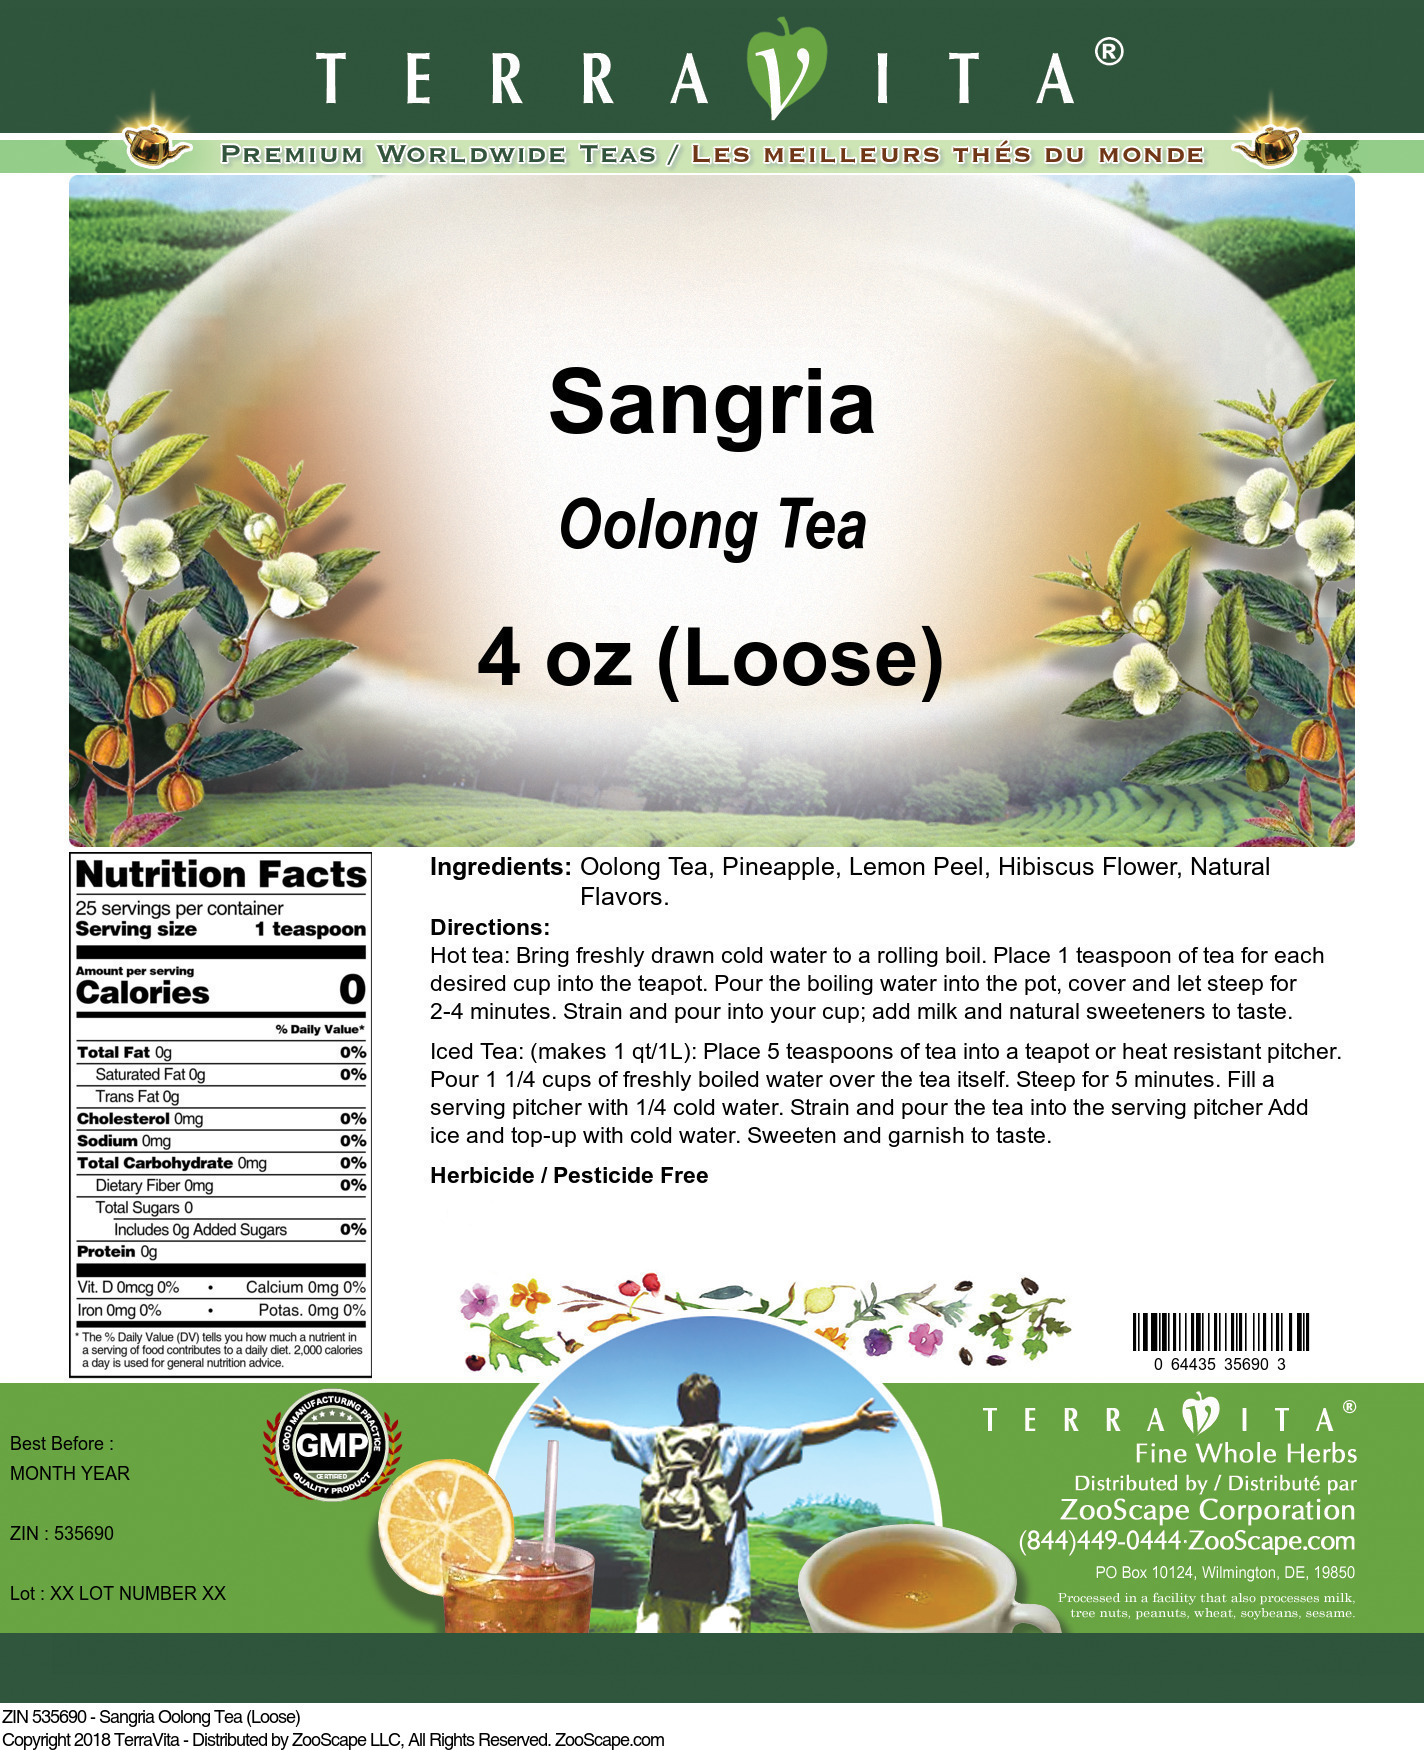 Sangria Oolong Tea (Loose)